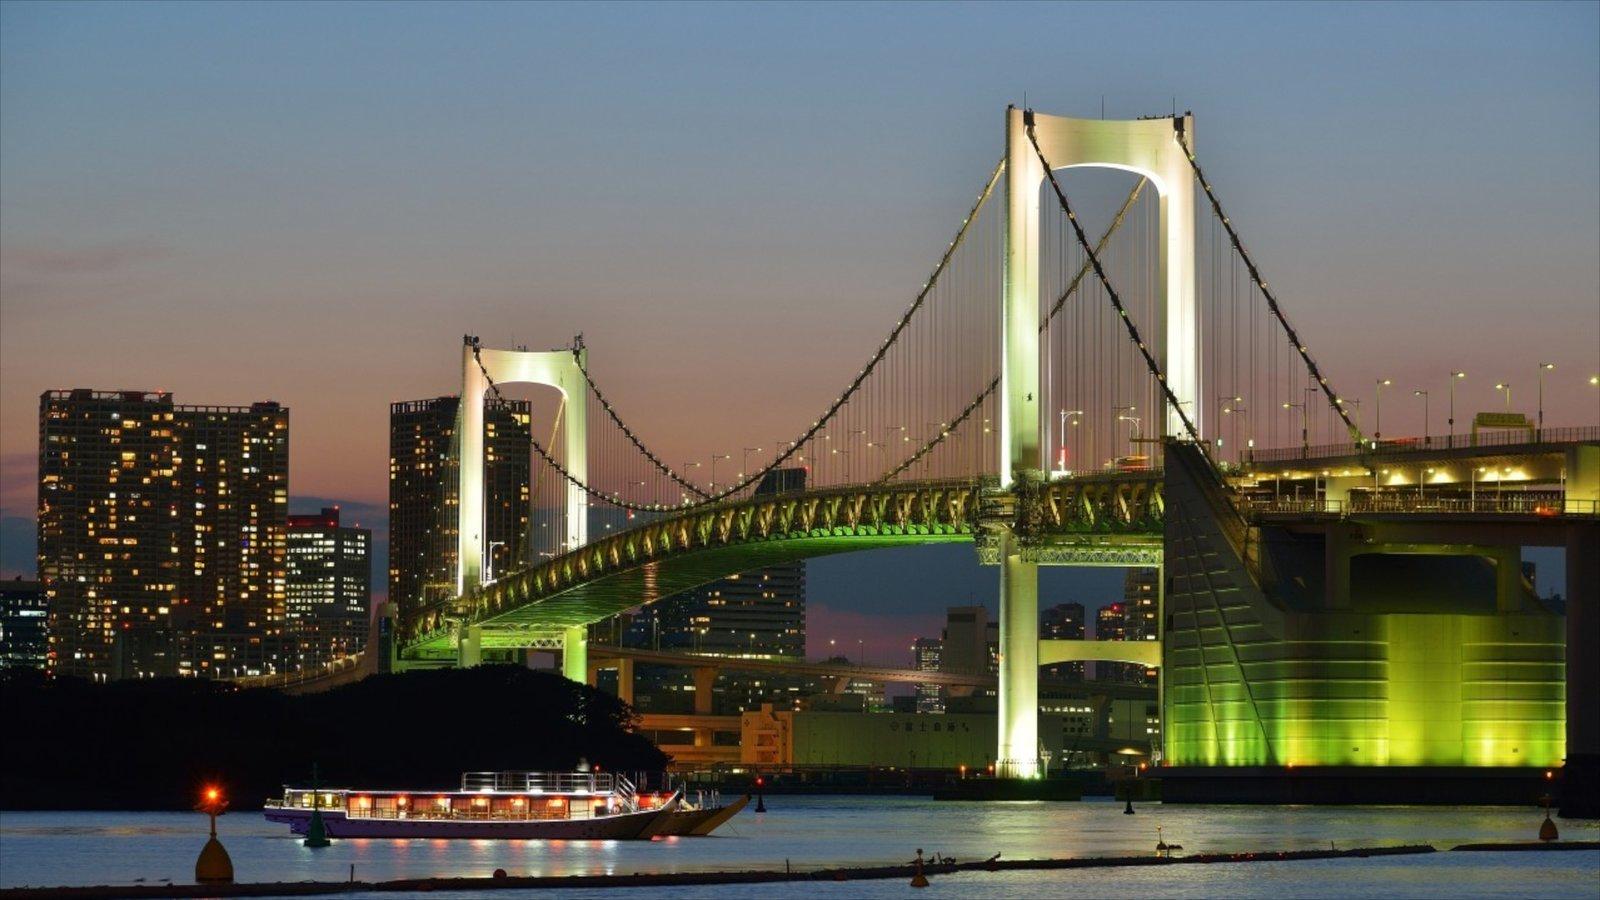 Rainbow Bridge showing a city, general coastal views and night scenes